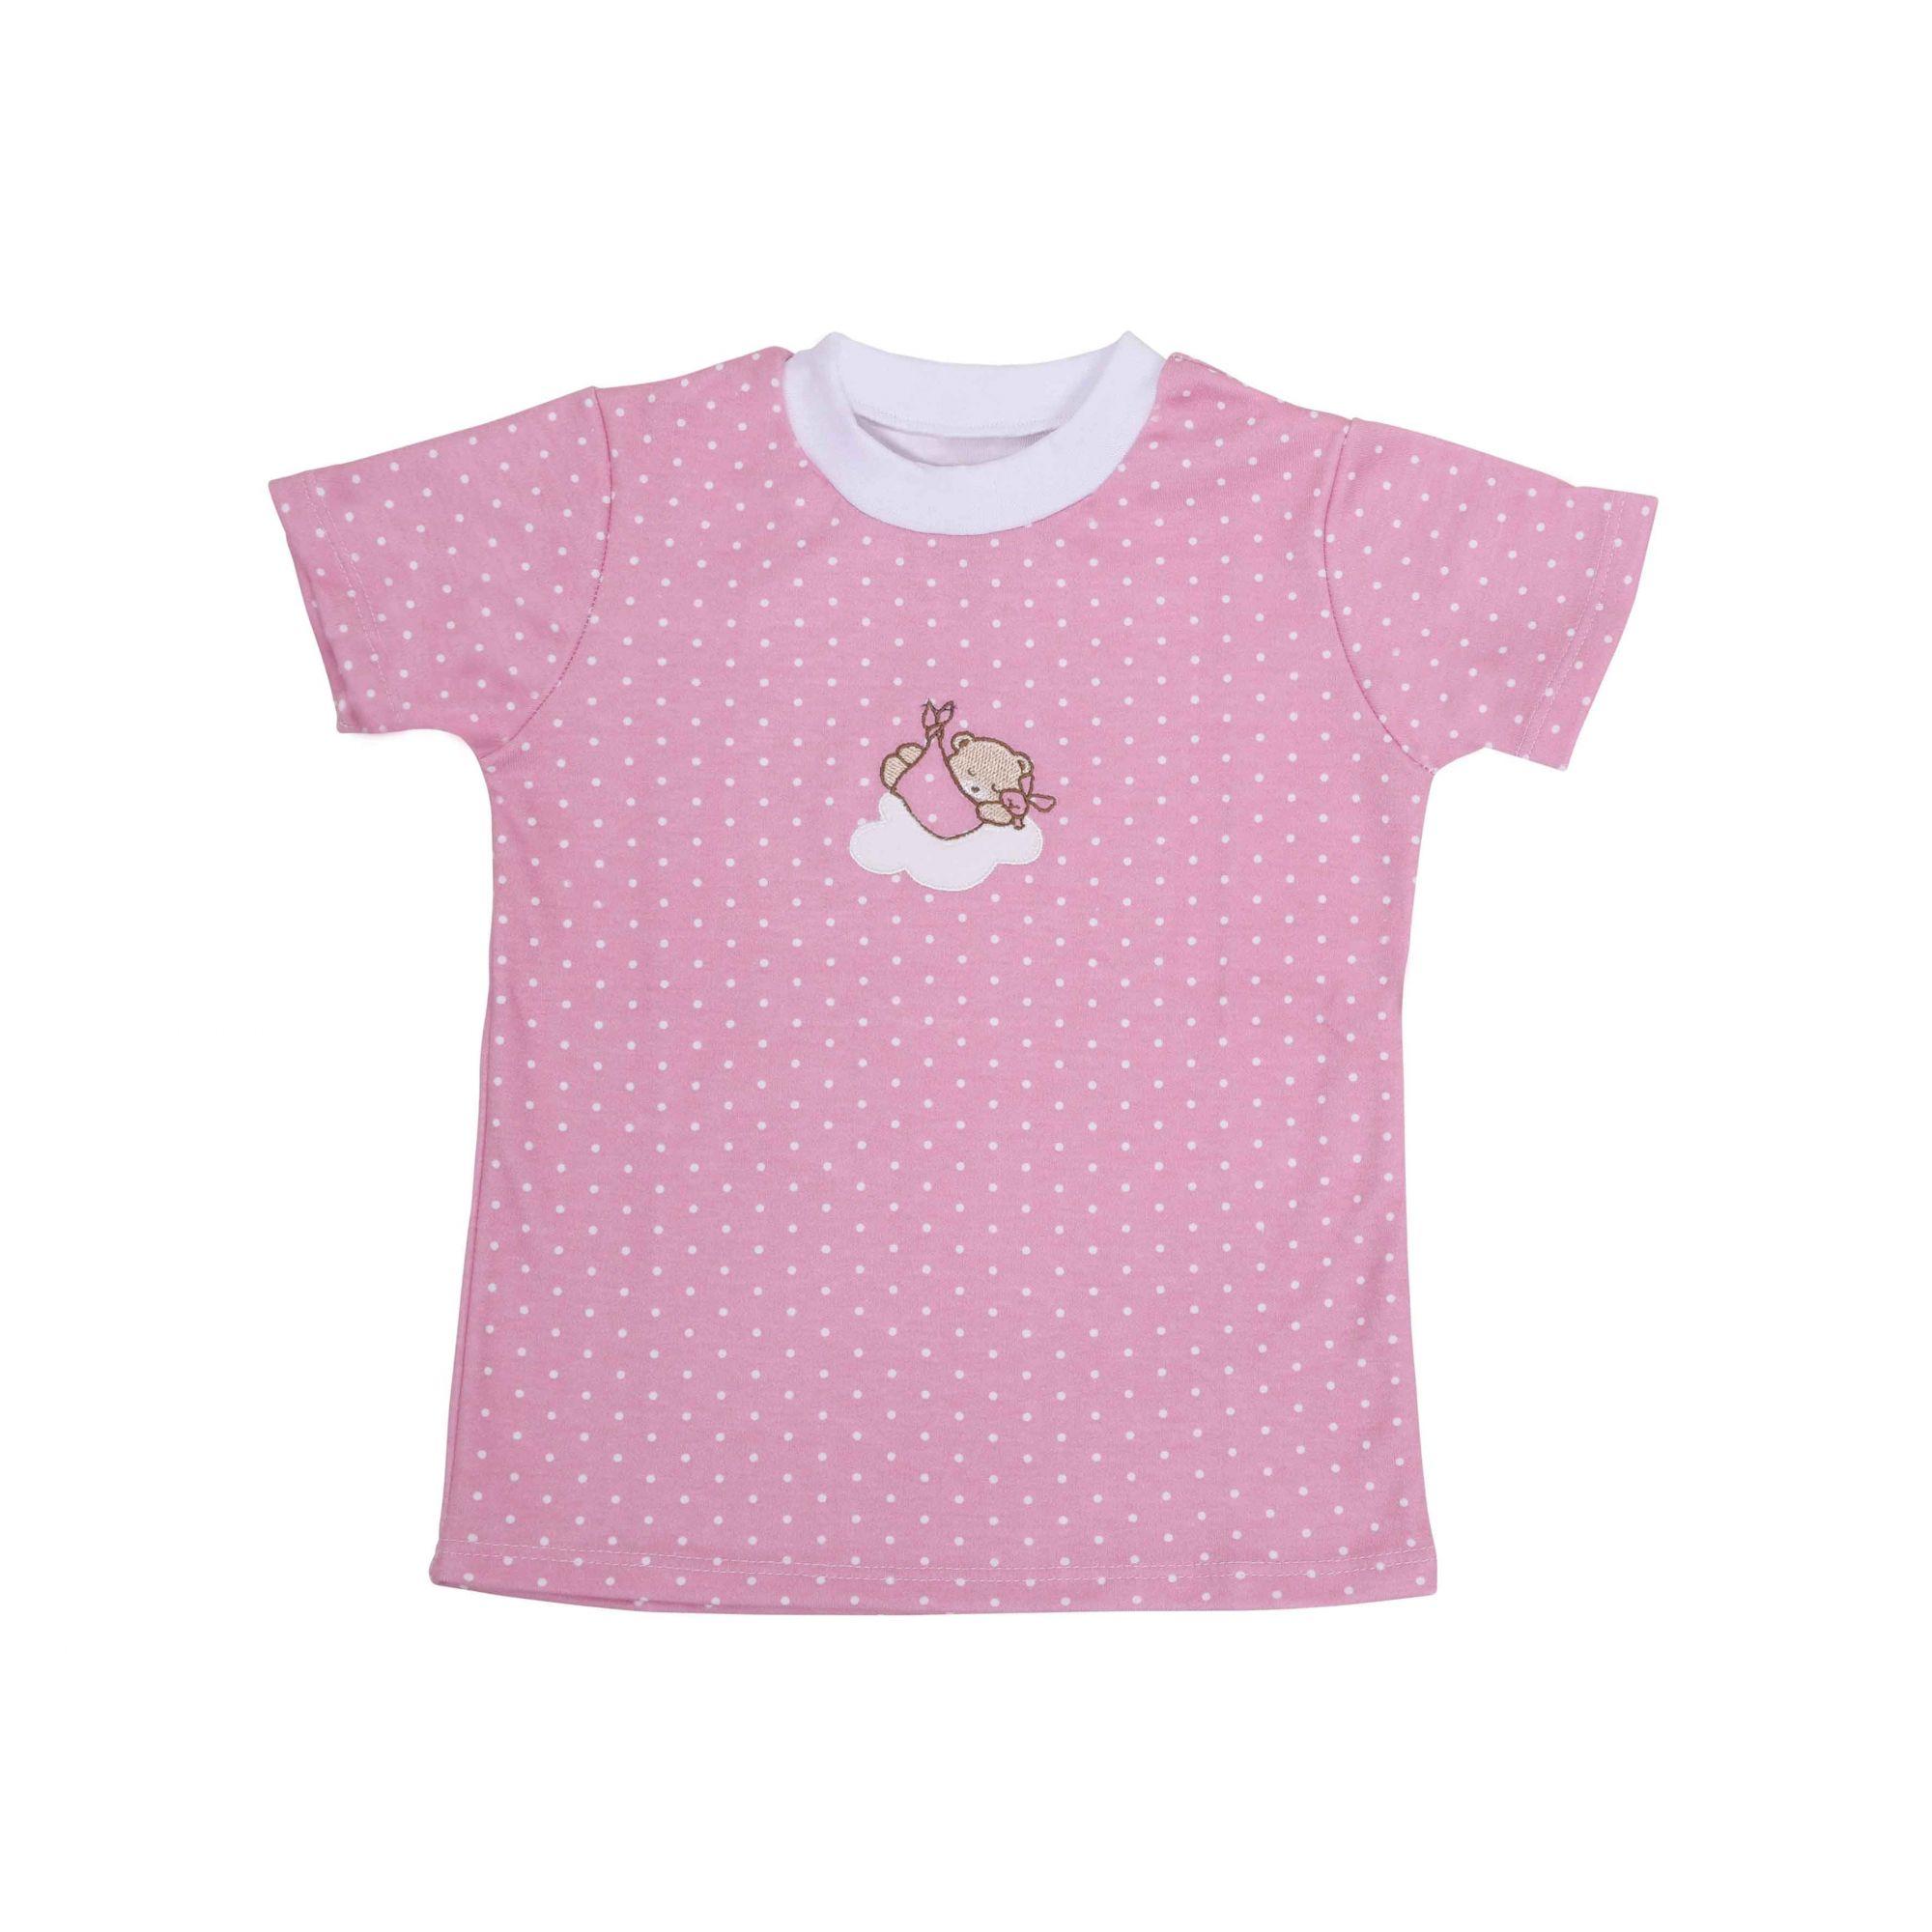 Kit Pijama Camiseta Manga Curta e Calça Rosa